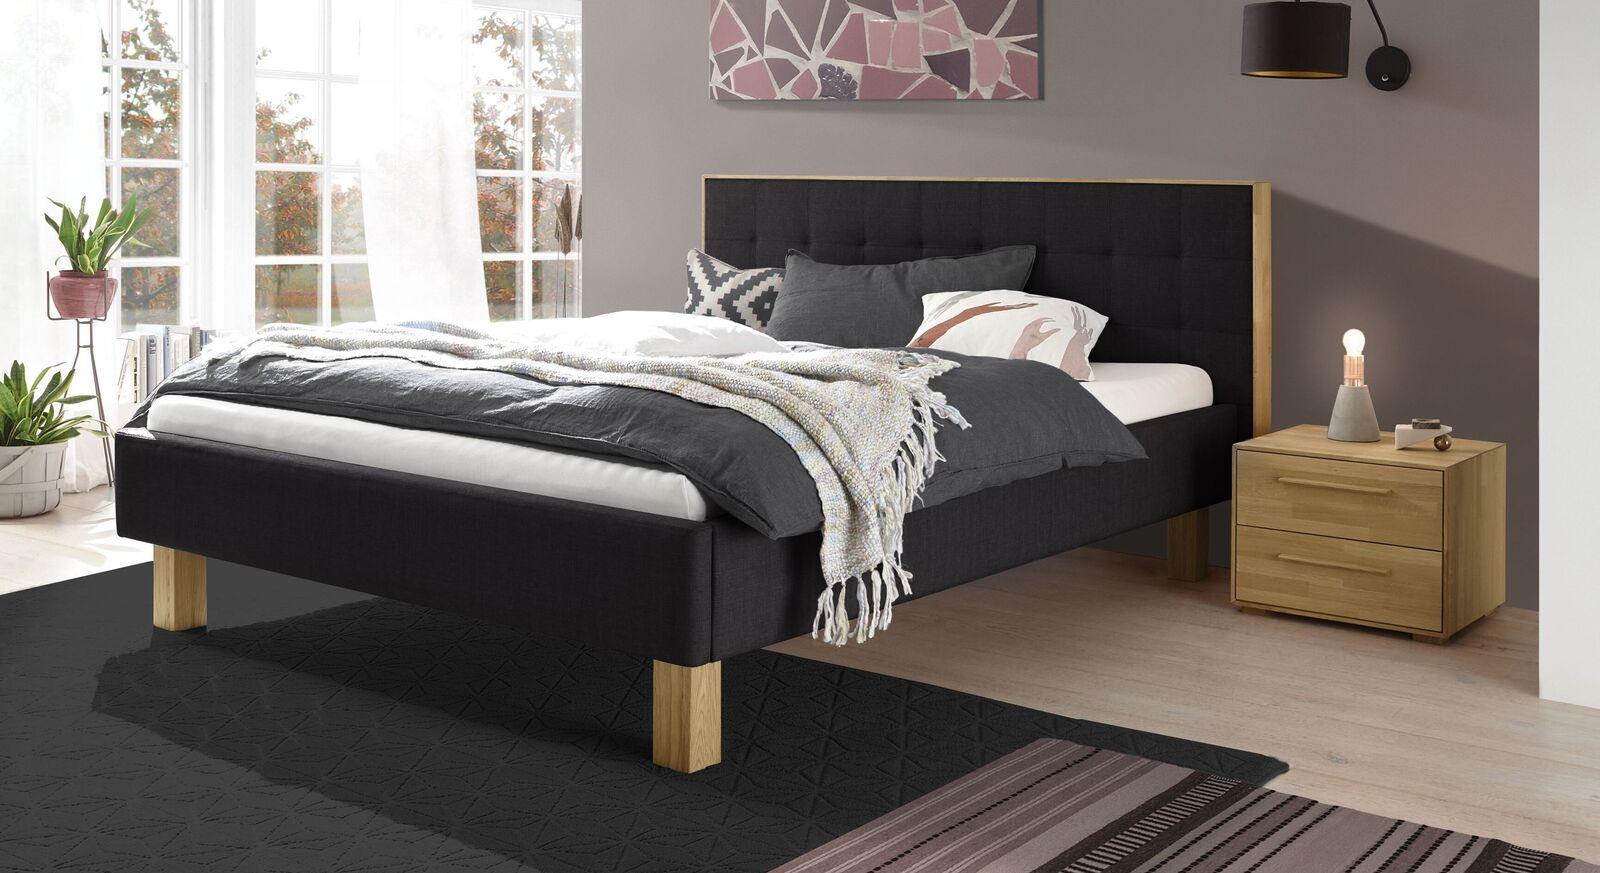 Bett Kadira aus anthrazitfarbenem Webstoff